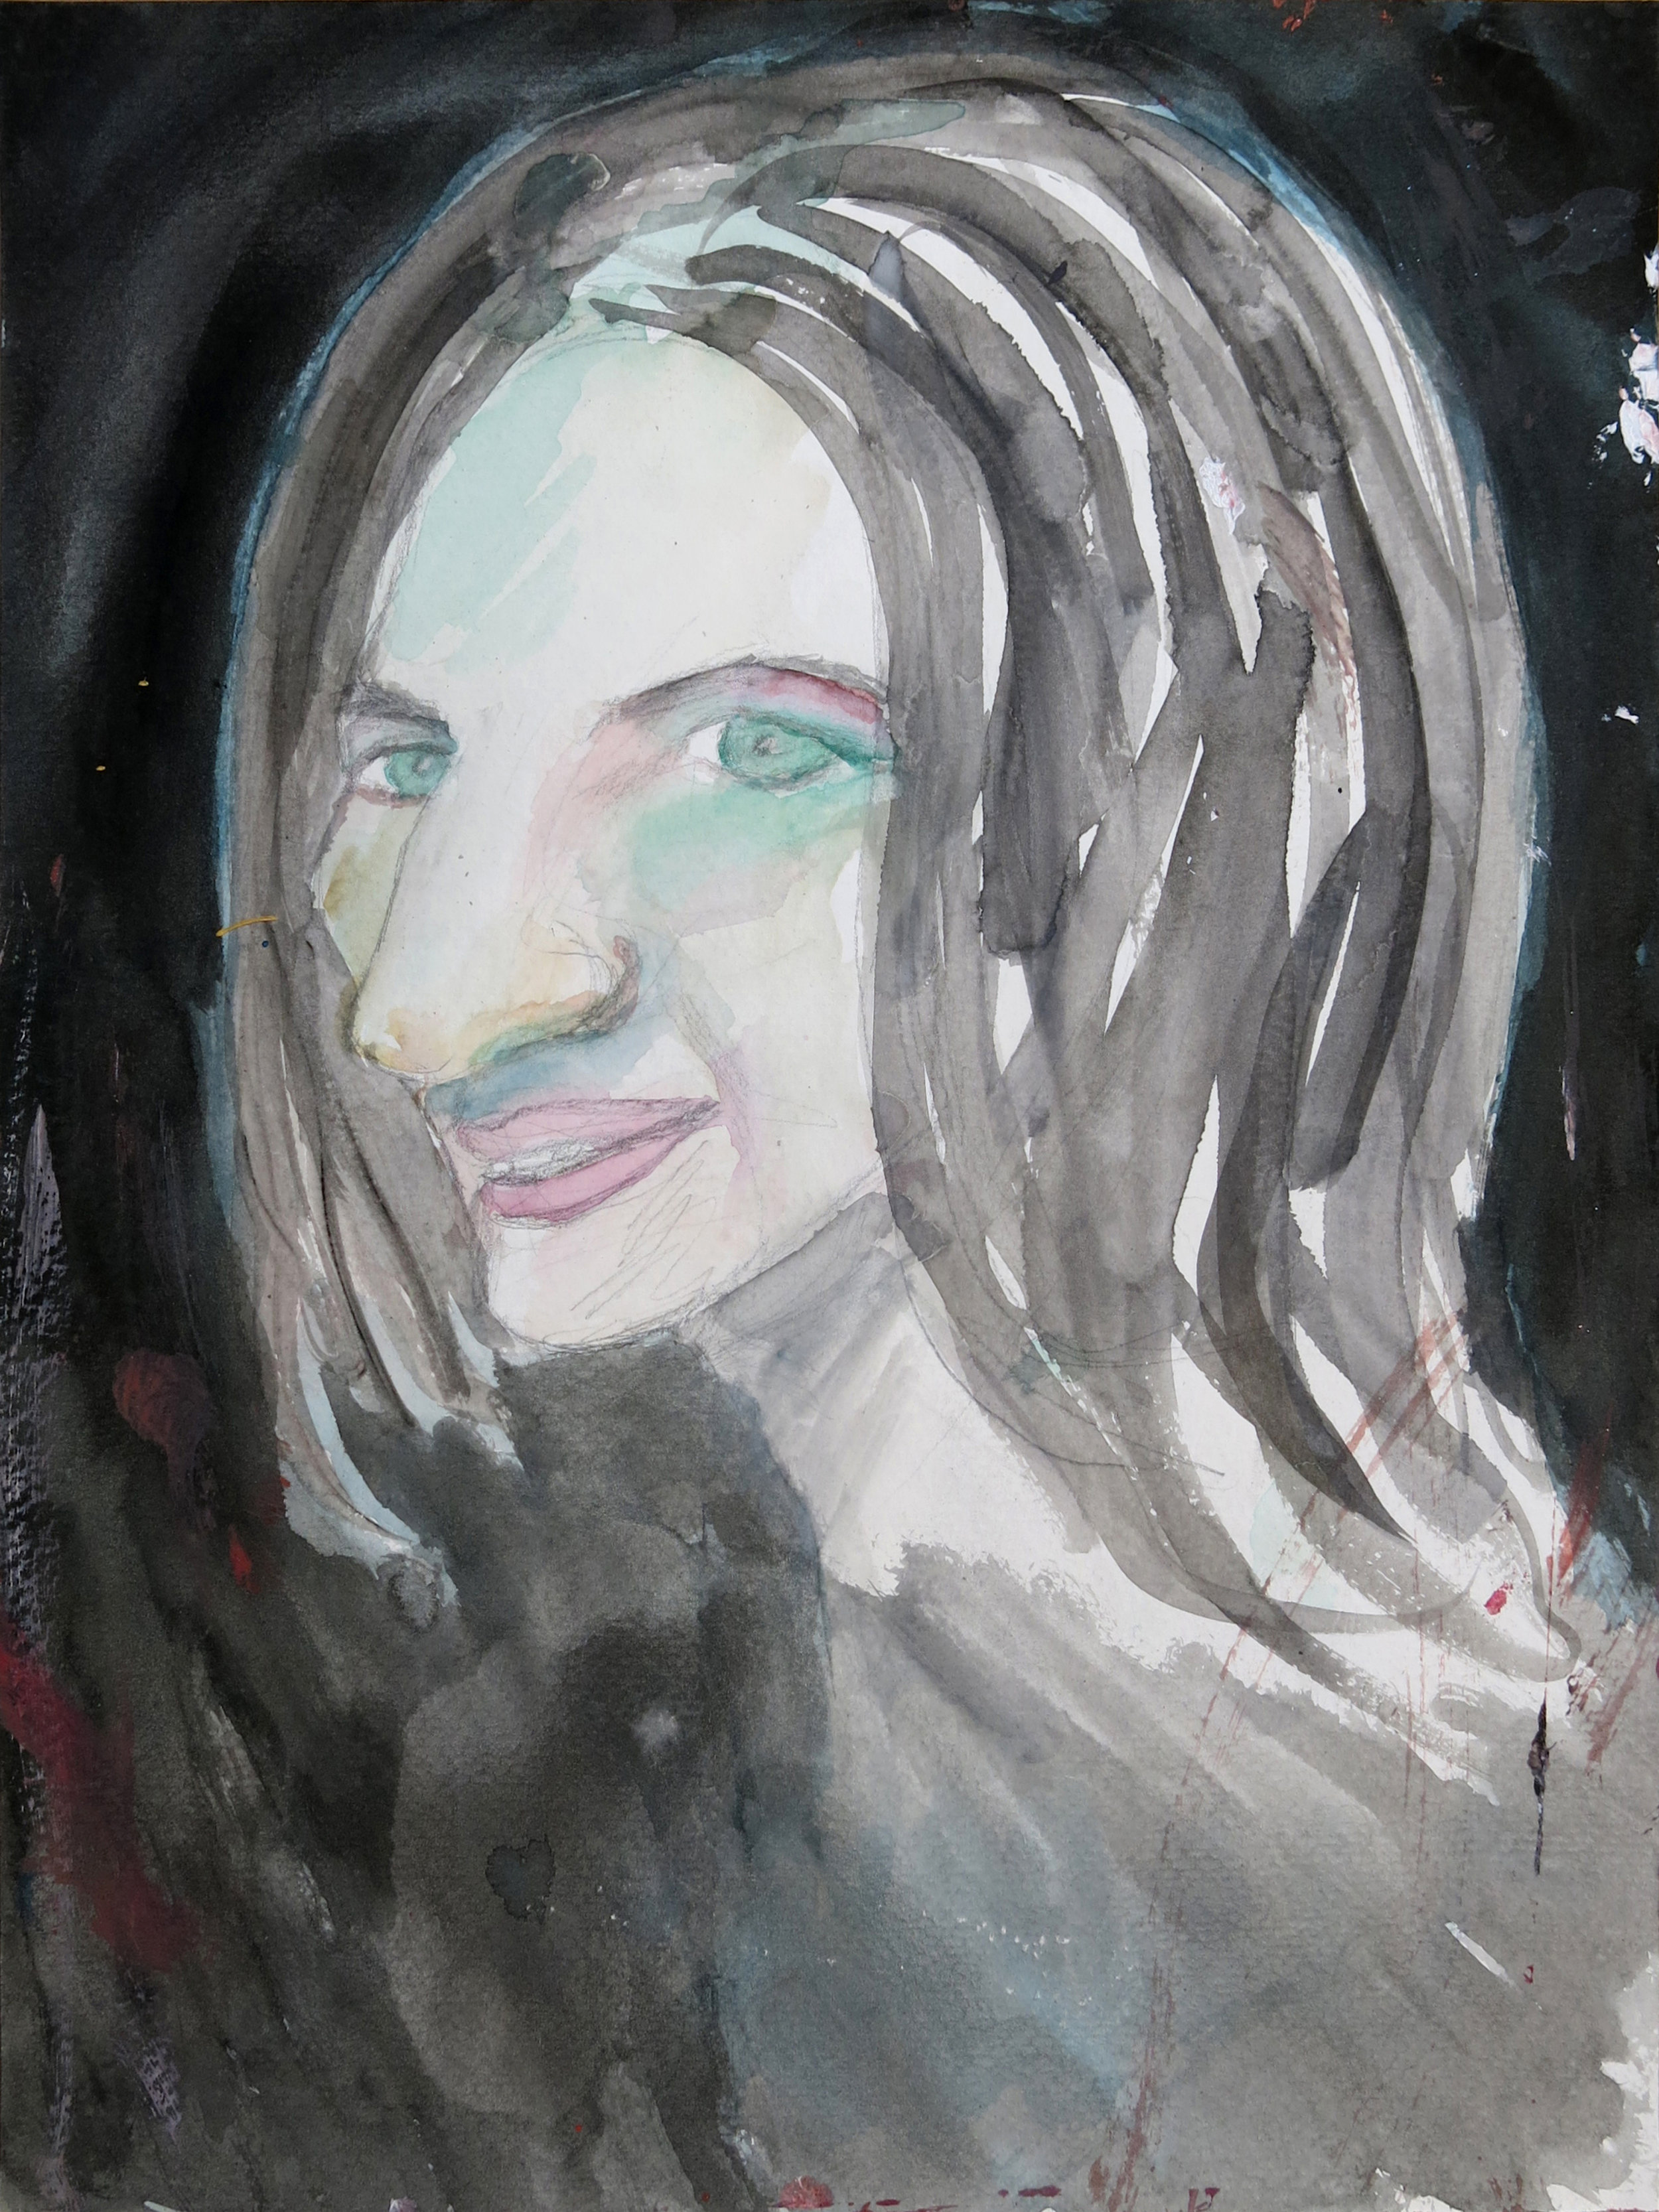 Barbra Streisand Portrait #202